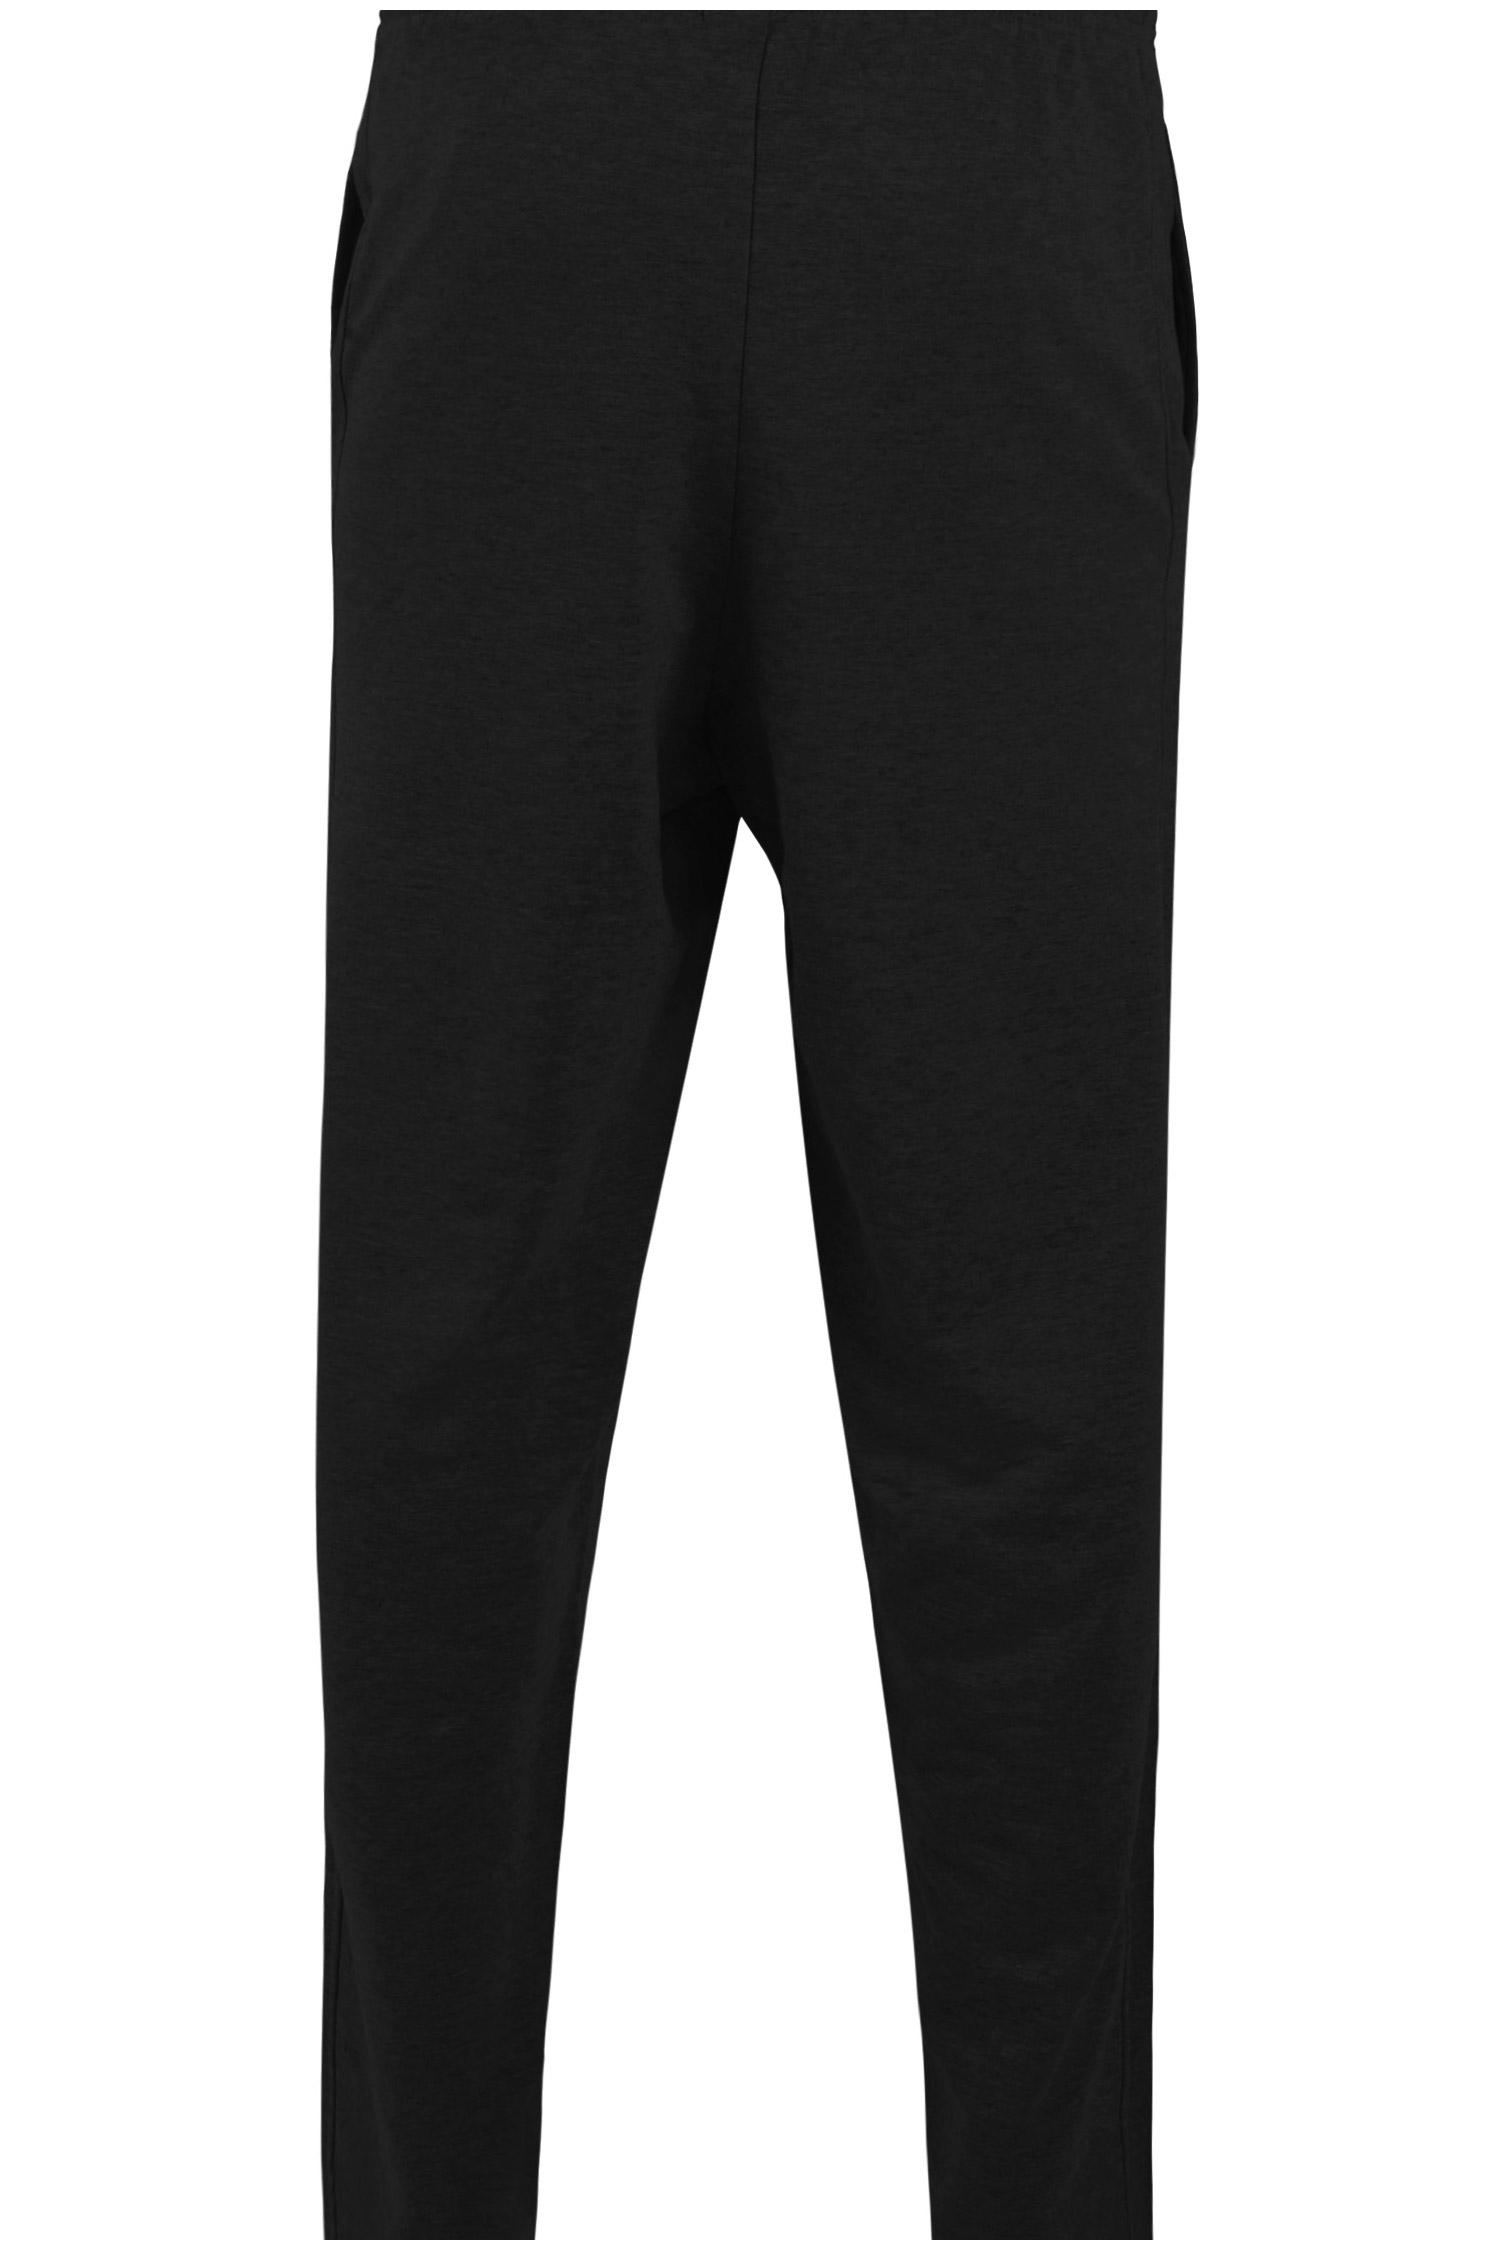 Pantalones, Chandal, 108810, GRIS MEDIO | Zoom